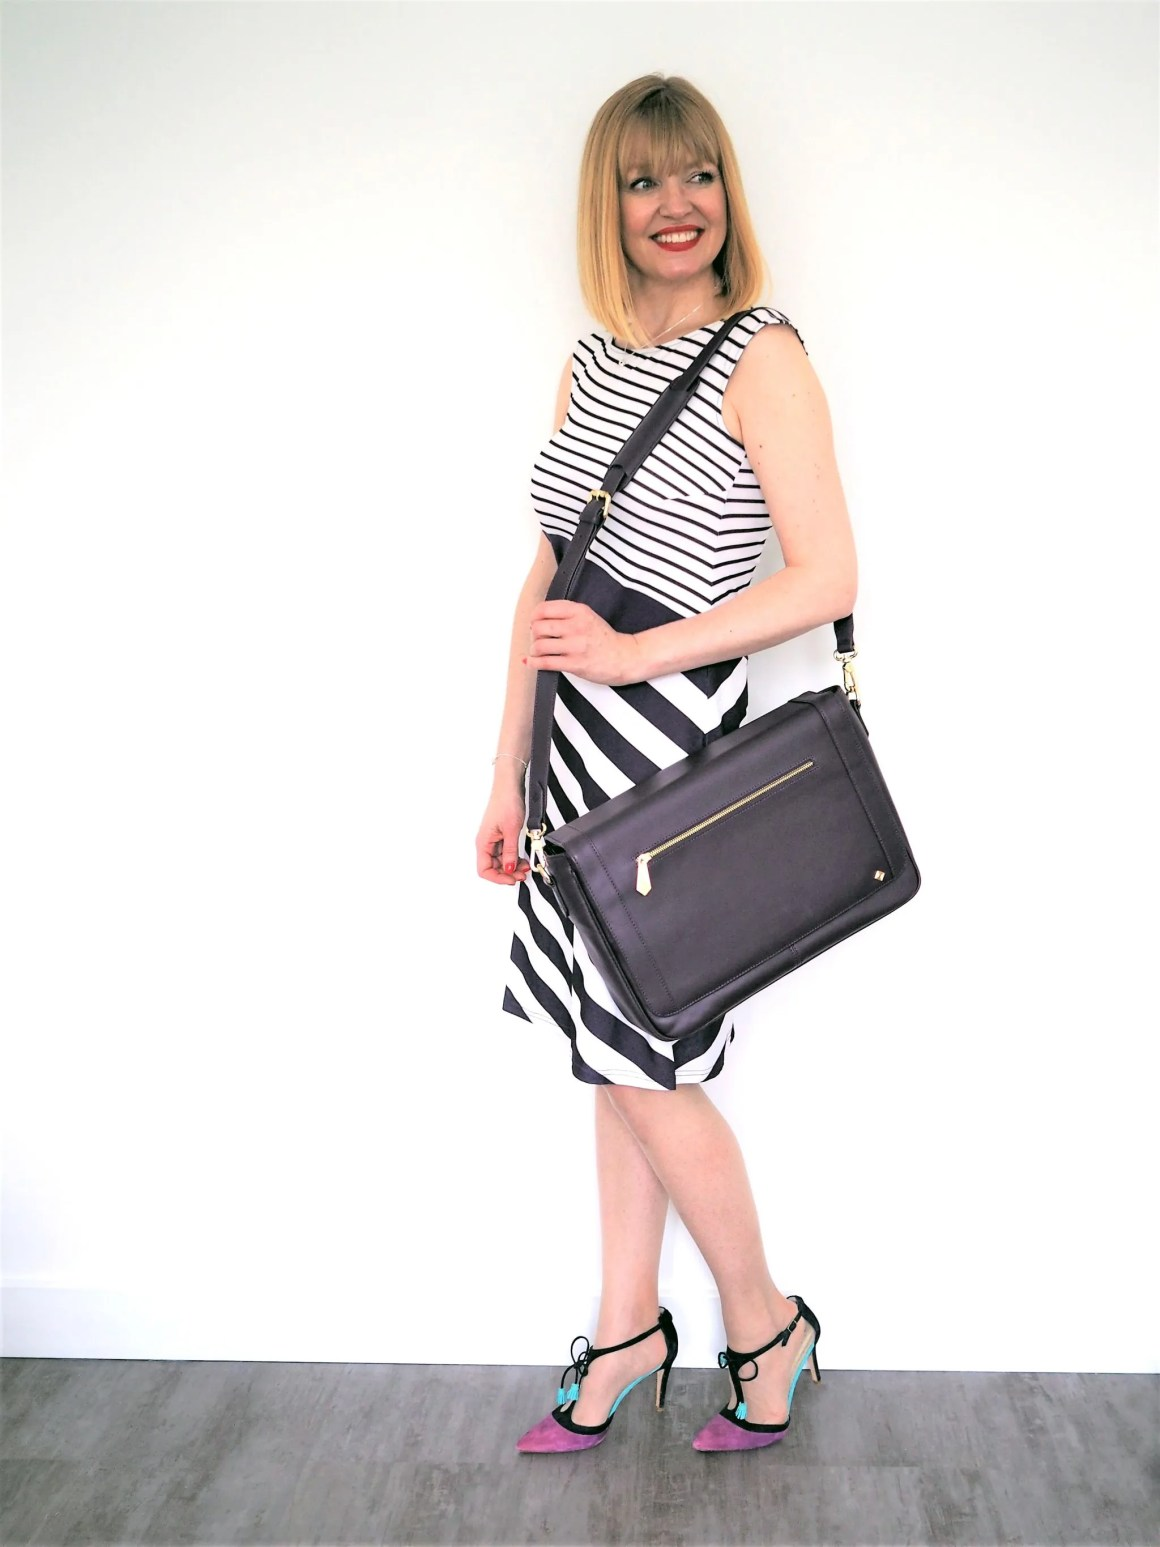 what-lizzy-loves-jennifer-hamley-model-kt-laptop-work-bag